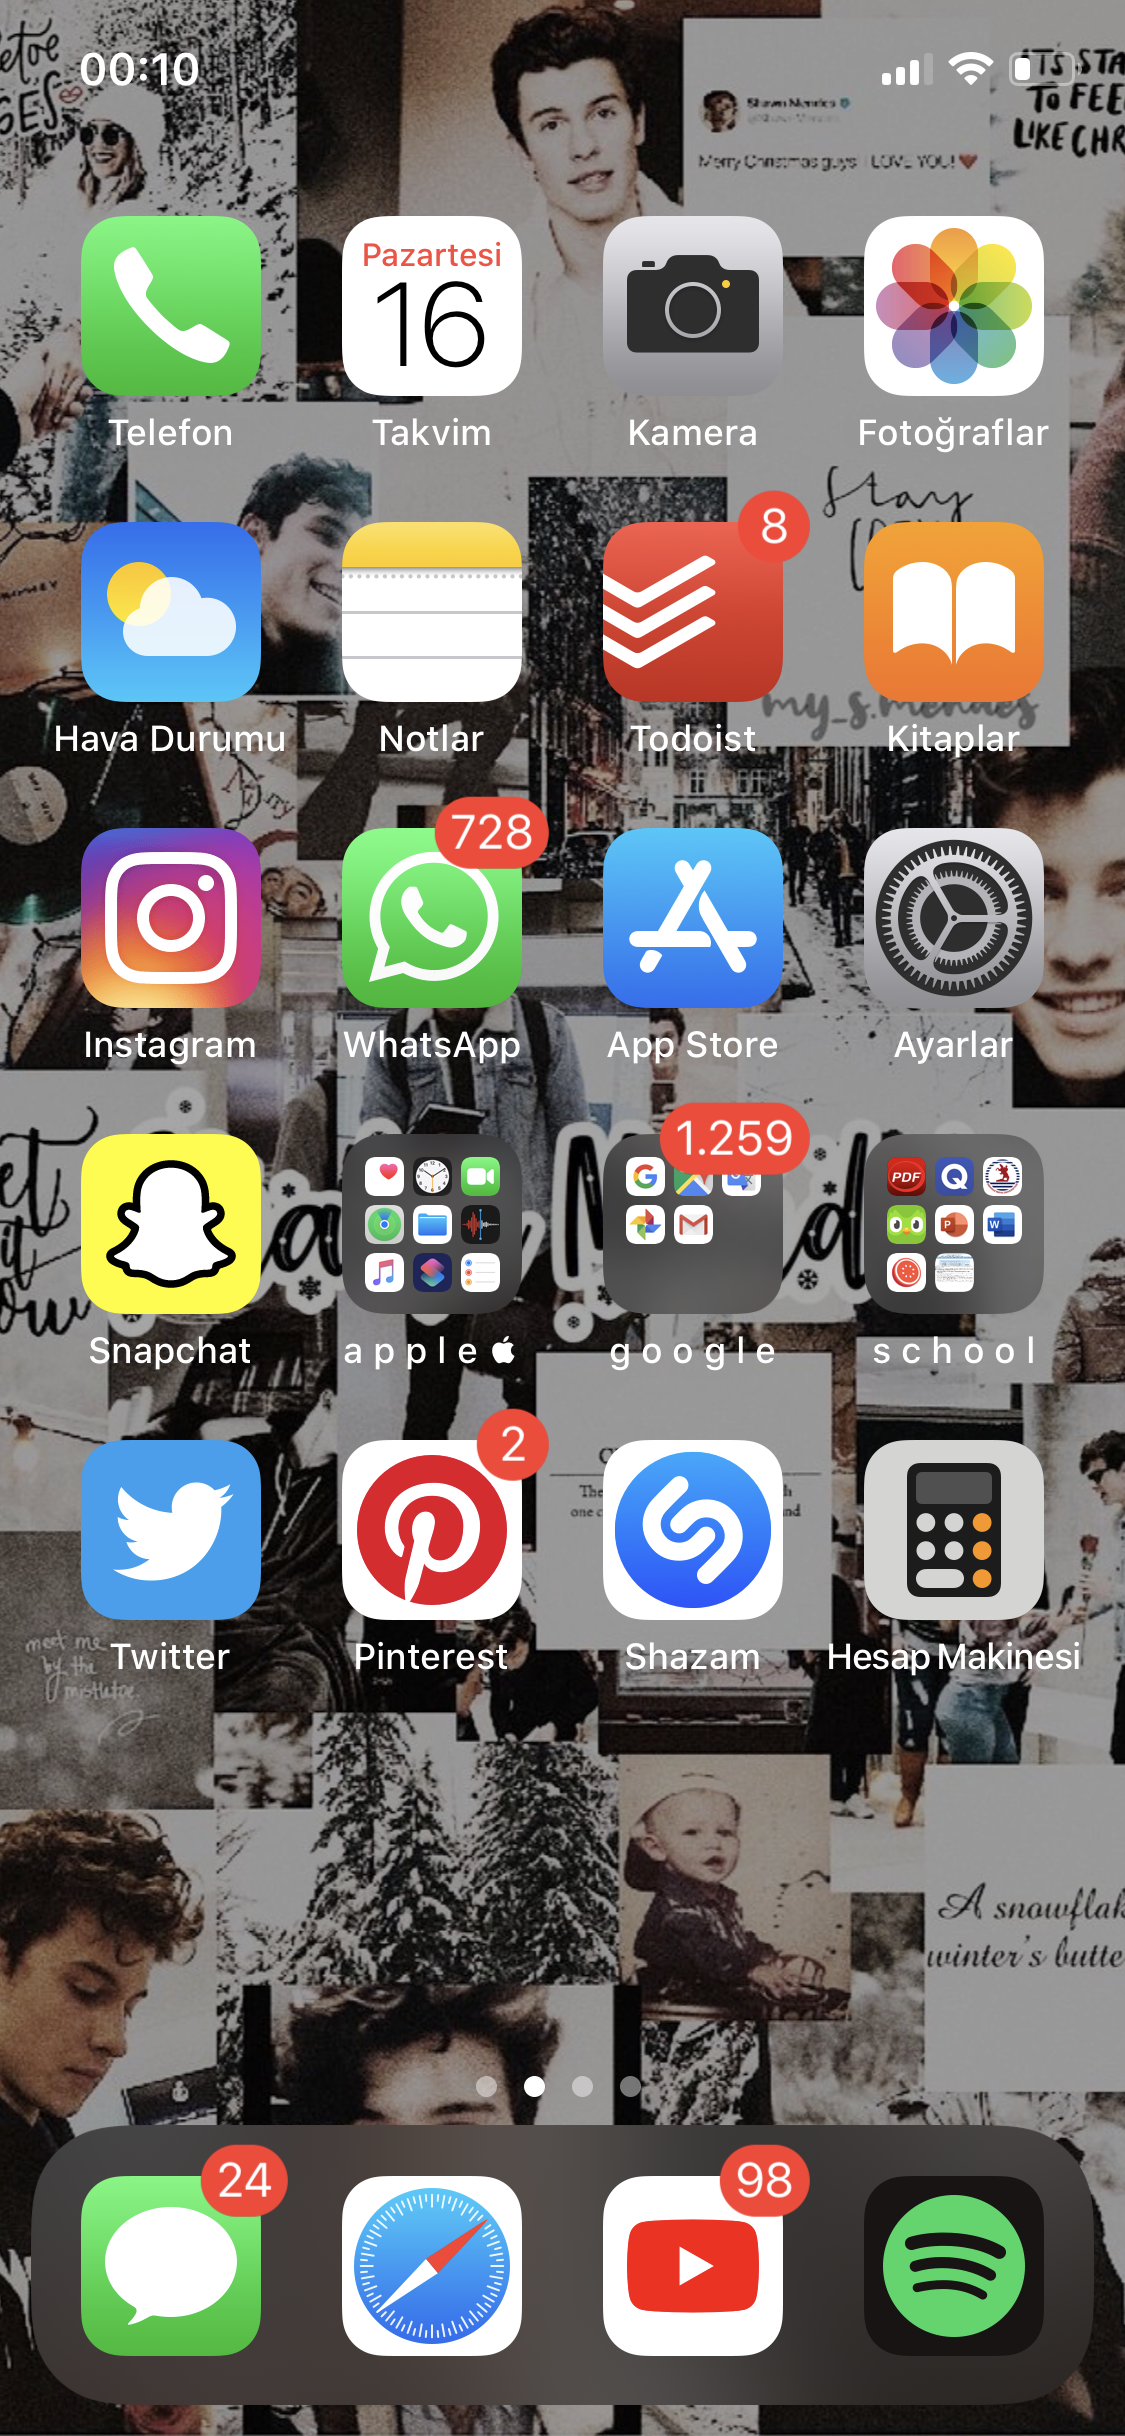 Apps Iphone Organization 11 Apple Organization Apps Organize Phone Apps Organize Apps On Iphone